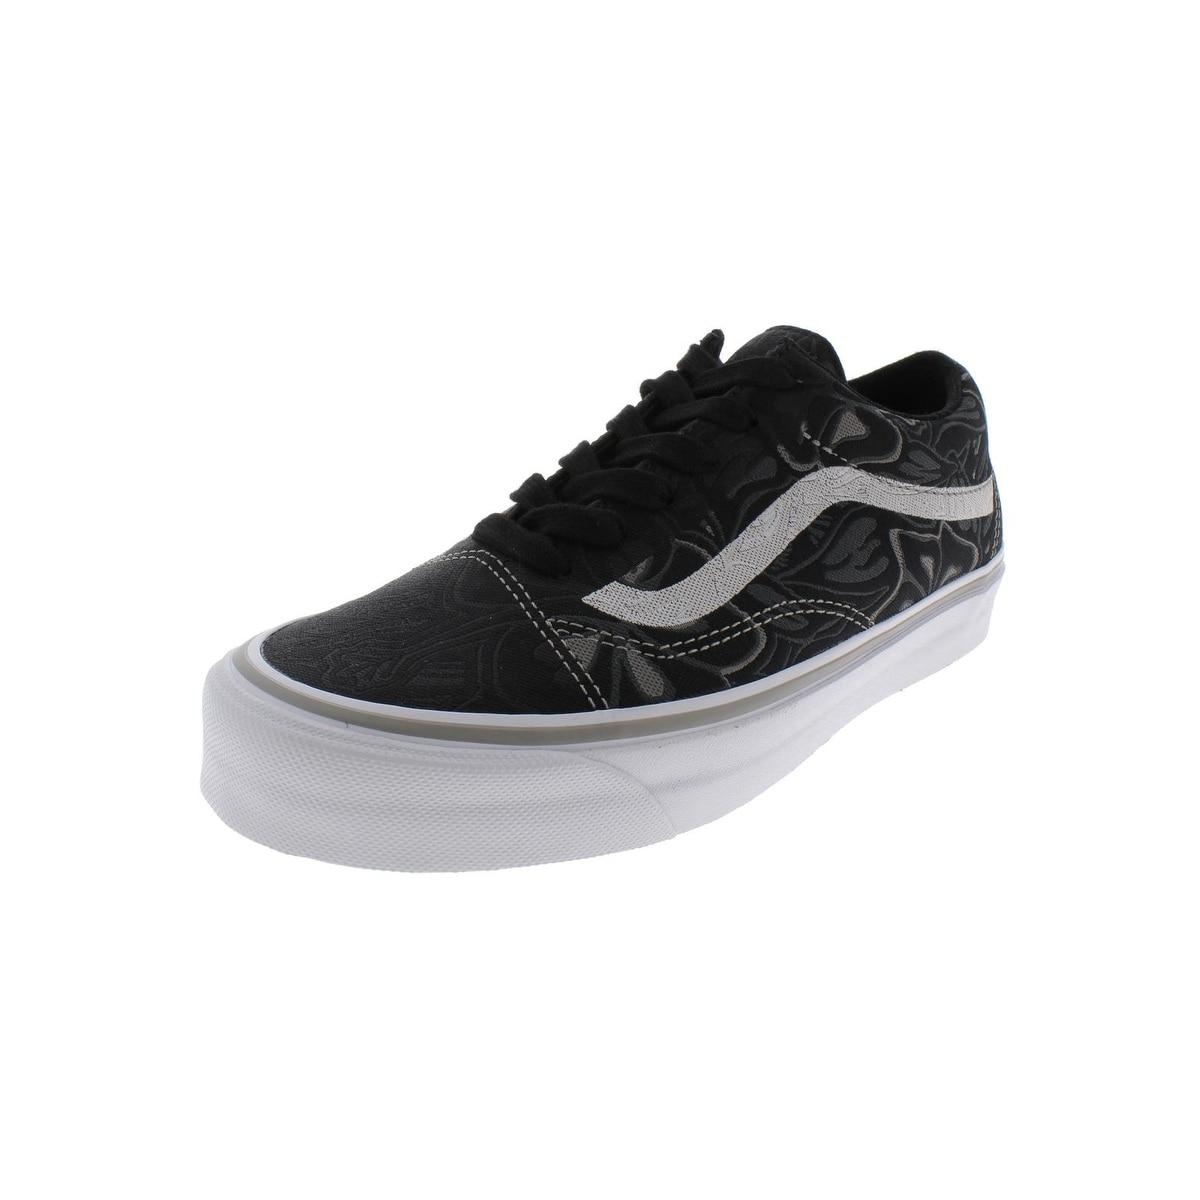 3014625e61 Buy Vans Women s Athletic Shoes Online at Overstock